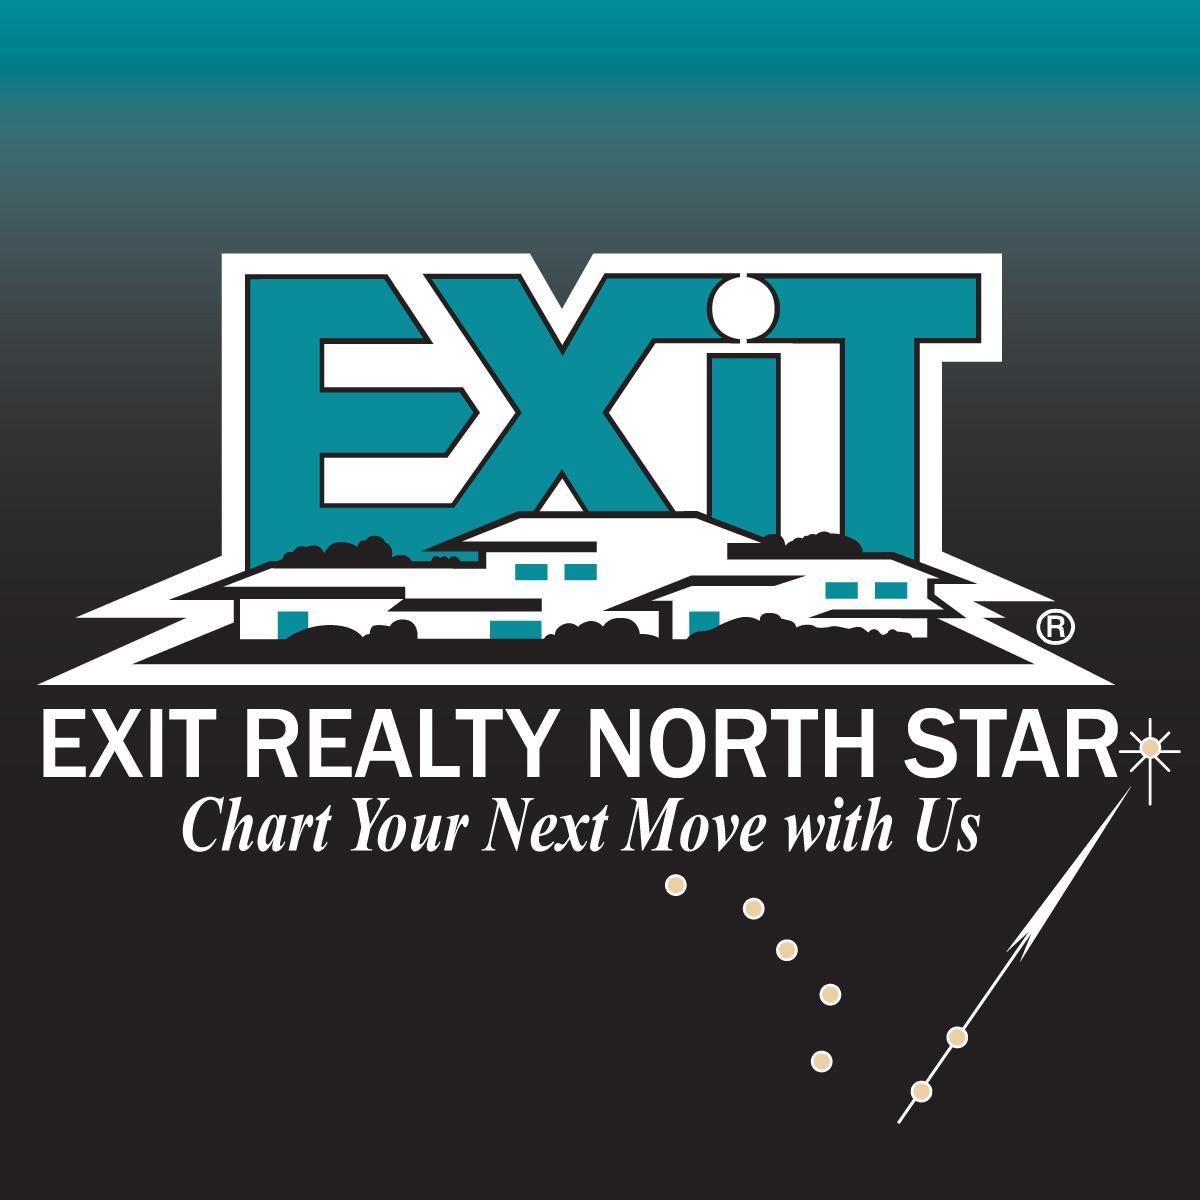 Exit Realty North Star Iowa bearing